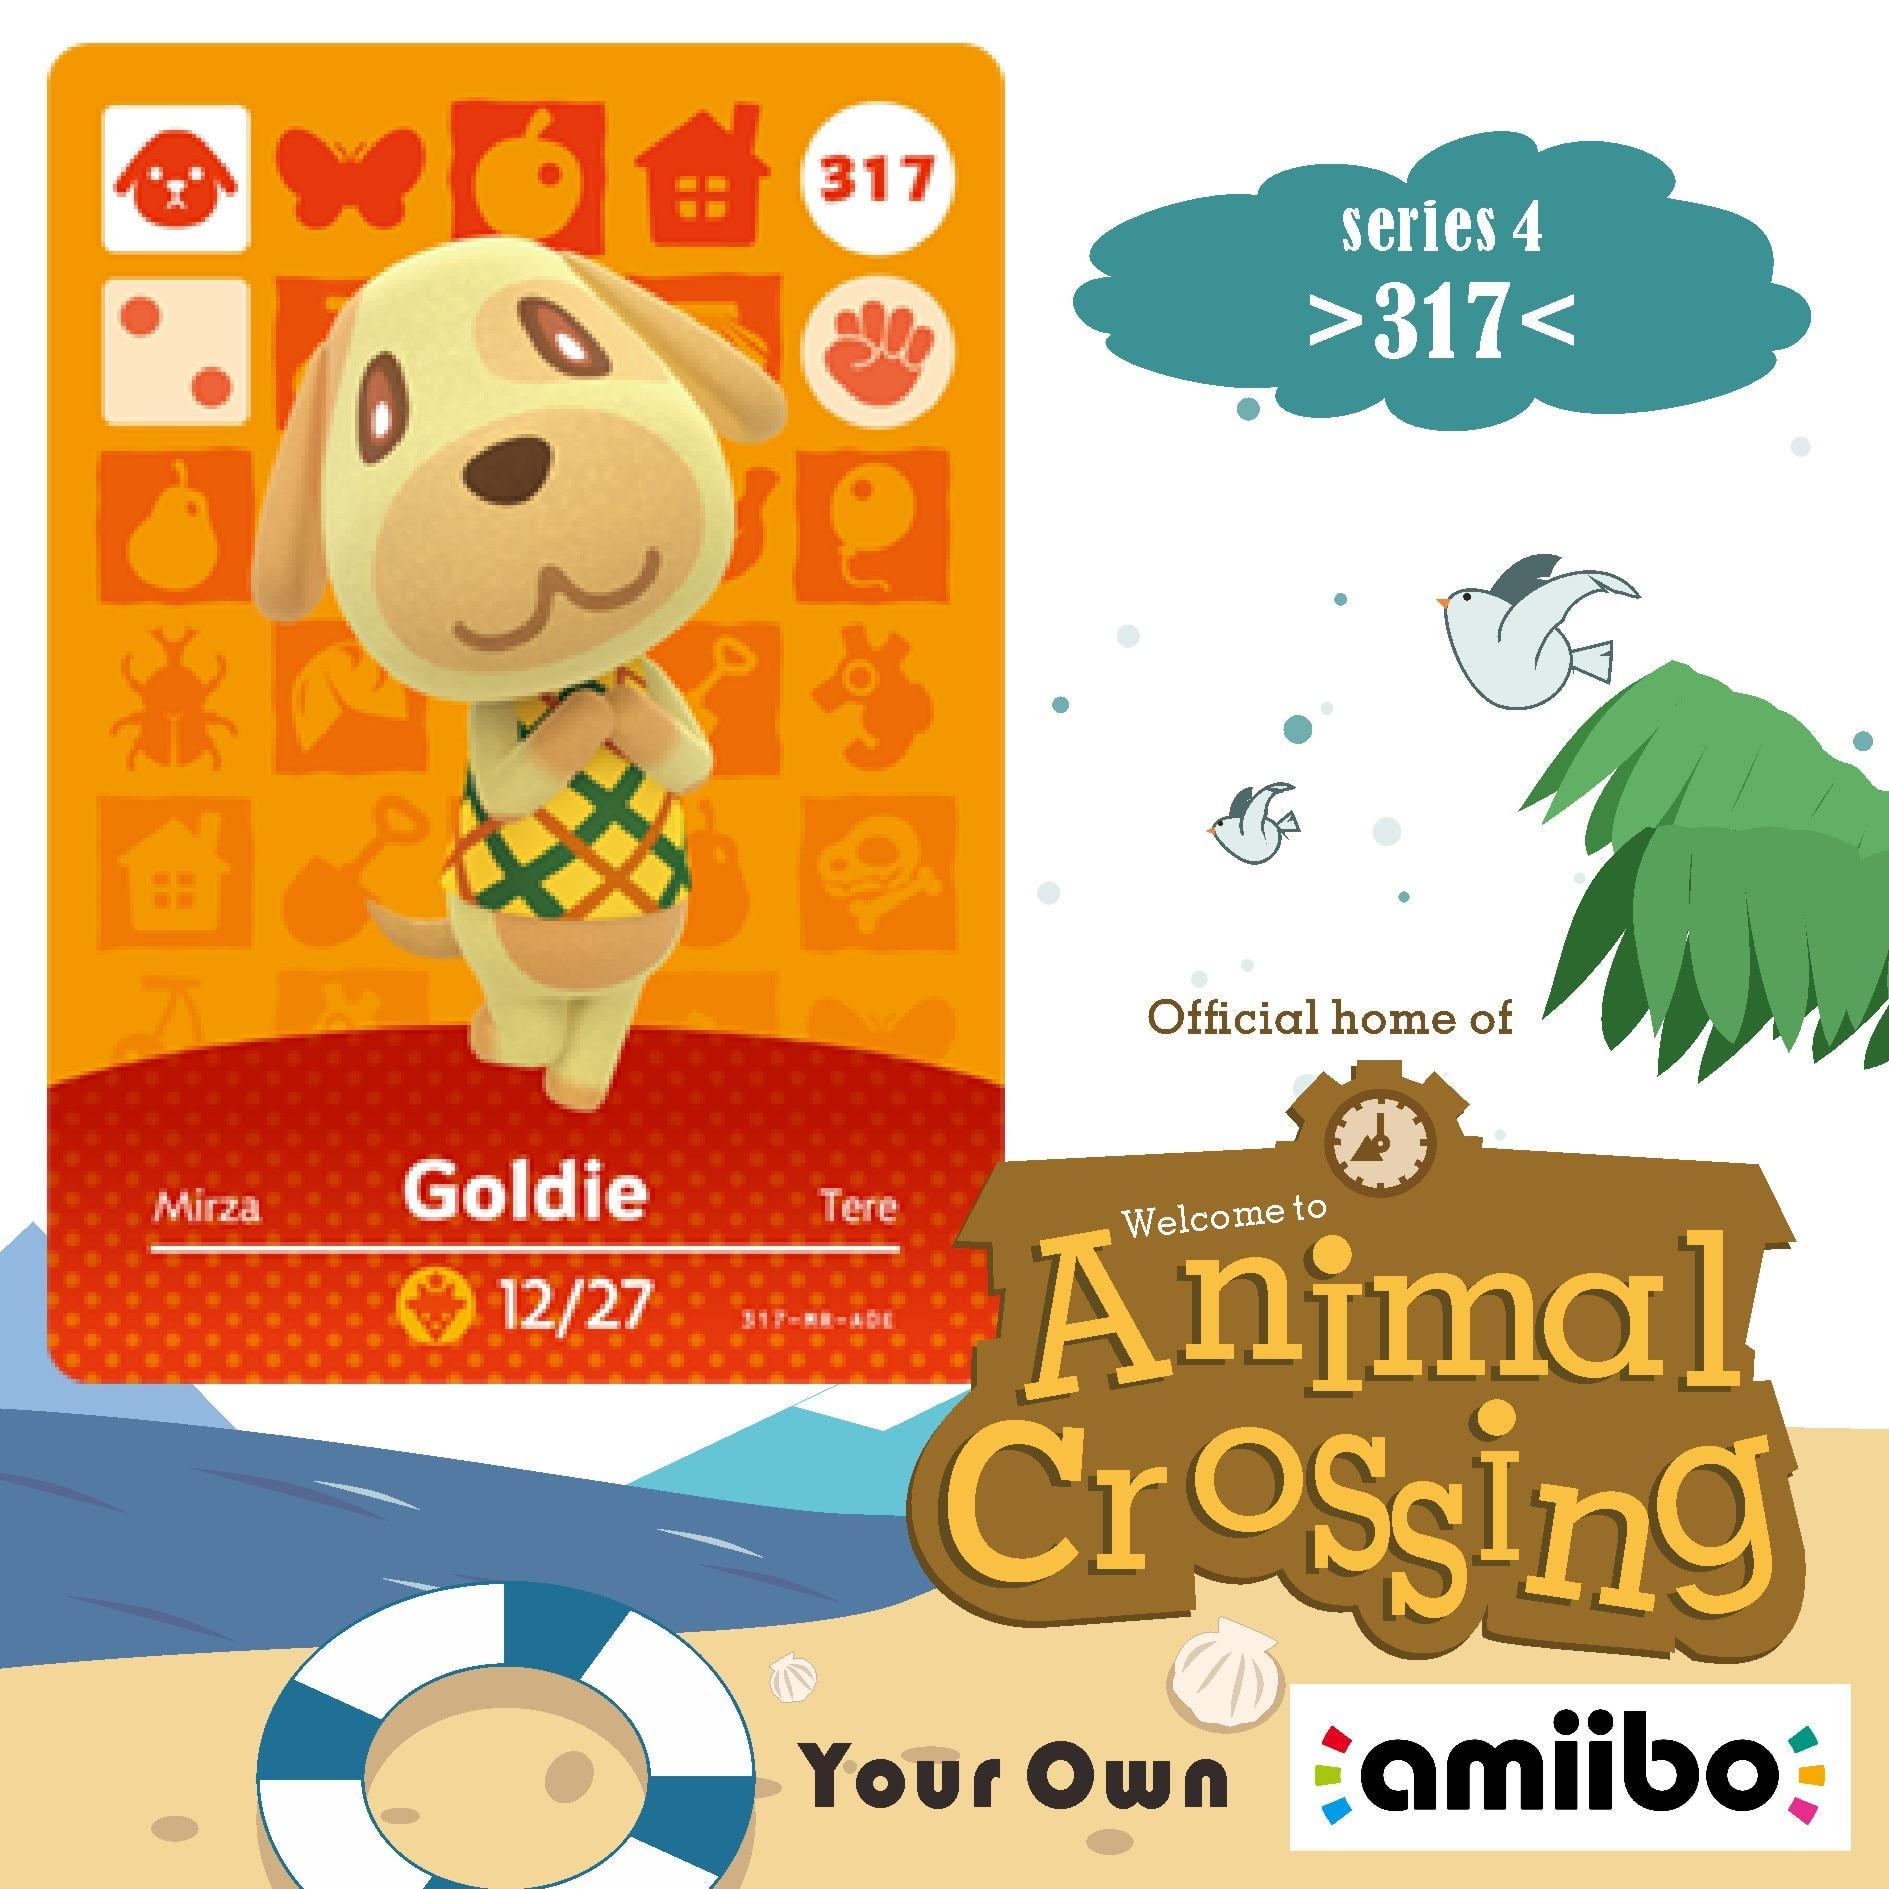 Amiibo Animal Crossing 317 Animal Crossing Amiibo Card Goldie Amiibo Goldie Cross Game Villager Card Series 4 317  Goldie